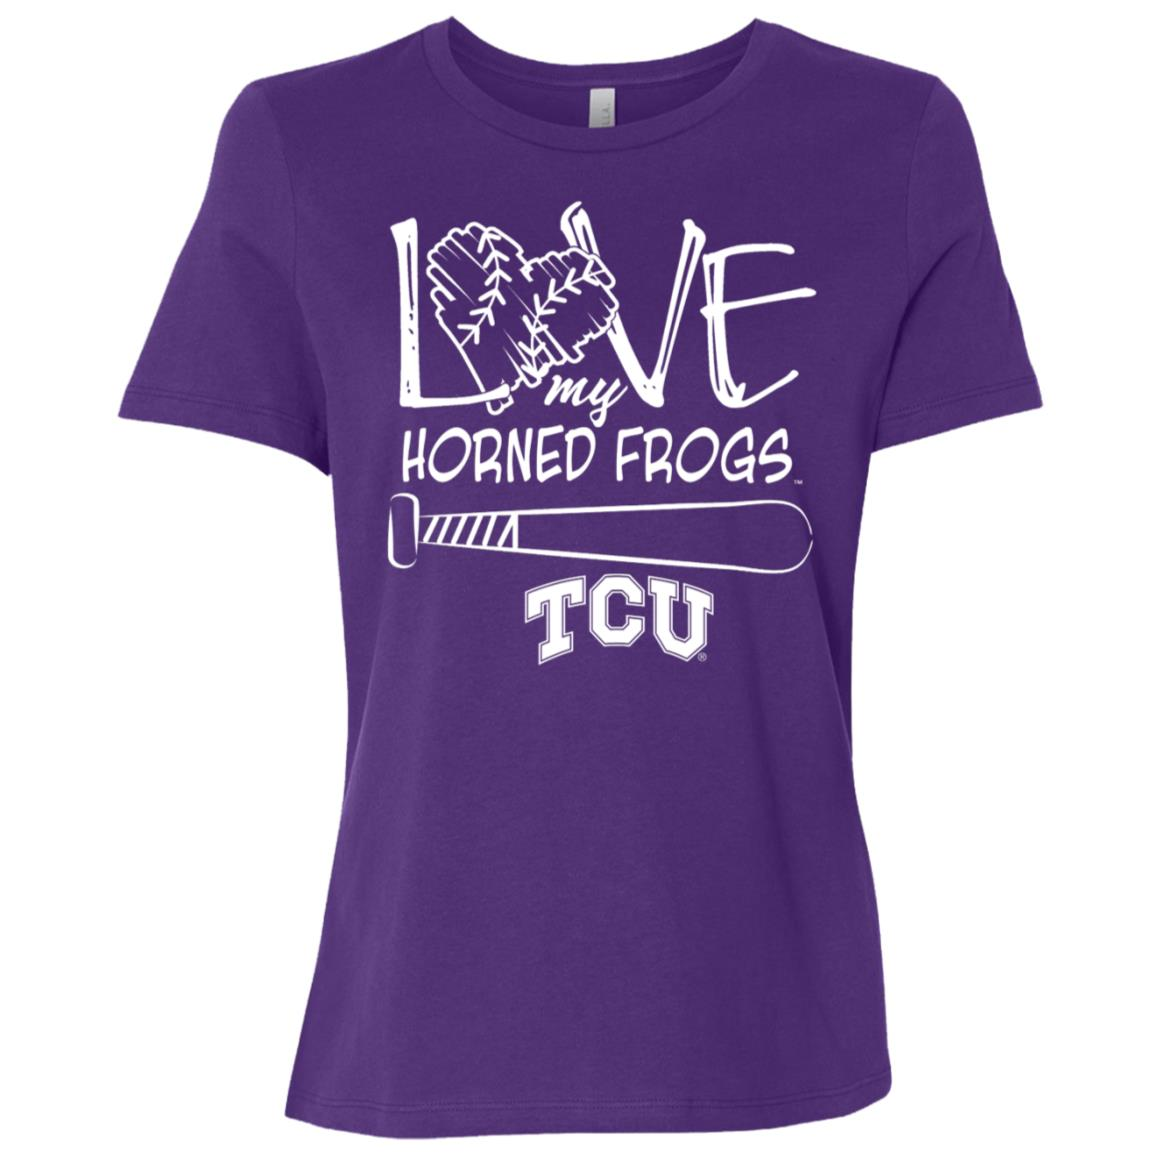 Tcu Horned Frogs Love Drawing Letters Women Short Sleeve T-Shirt